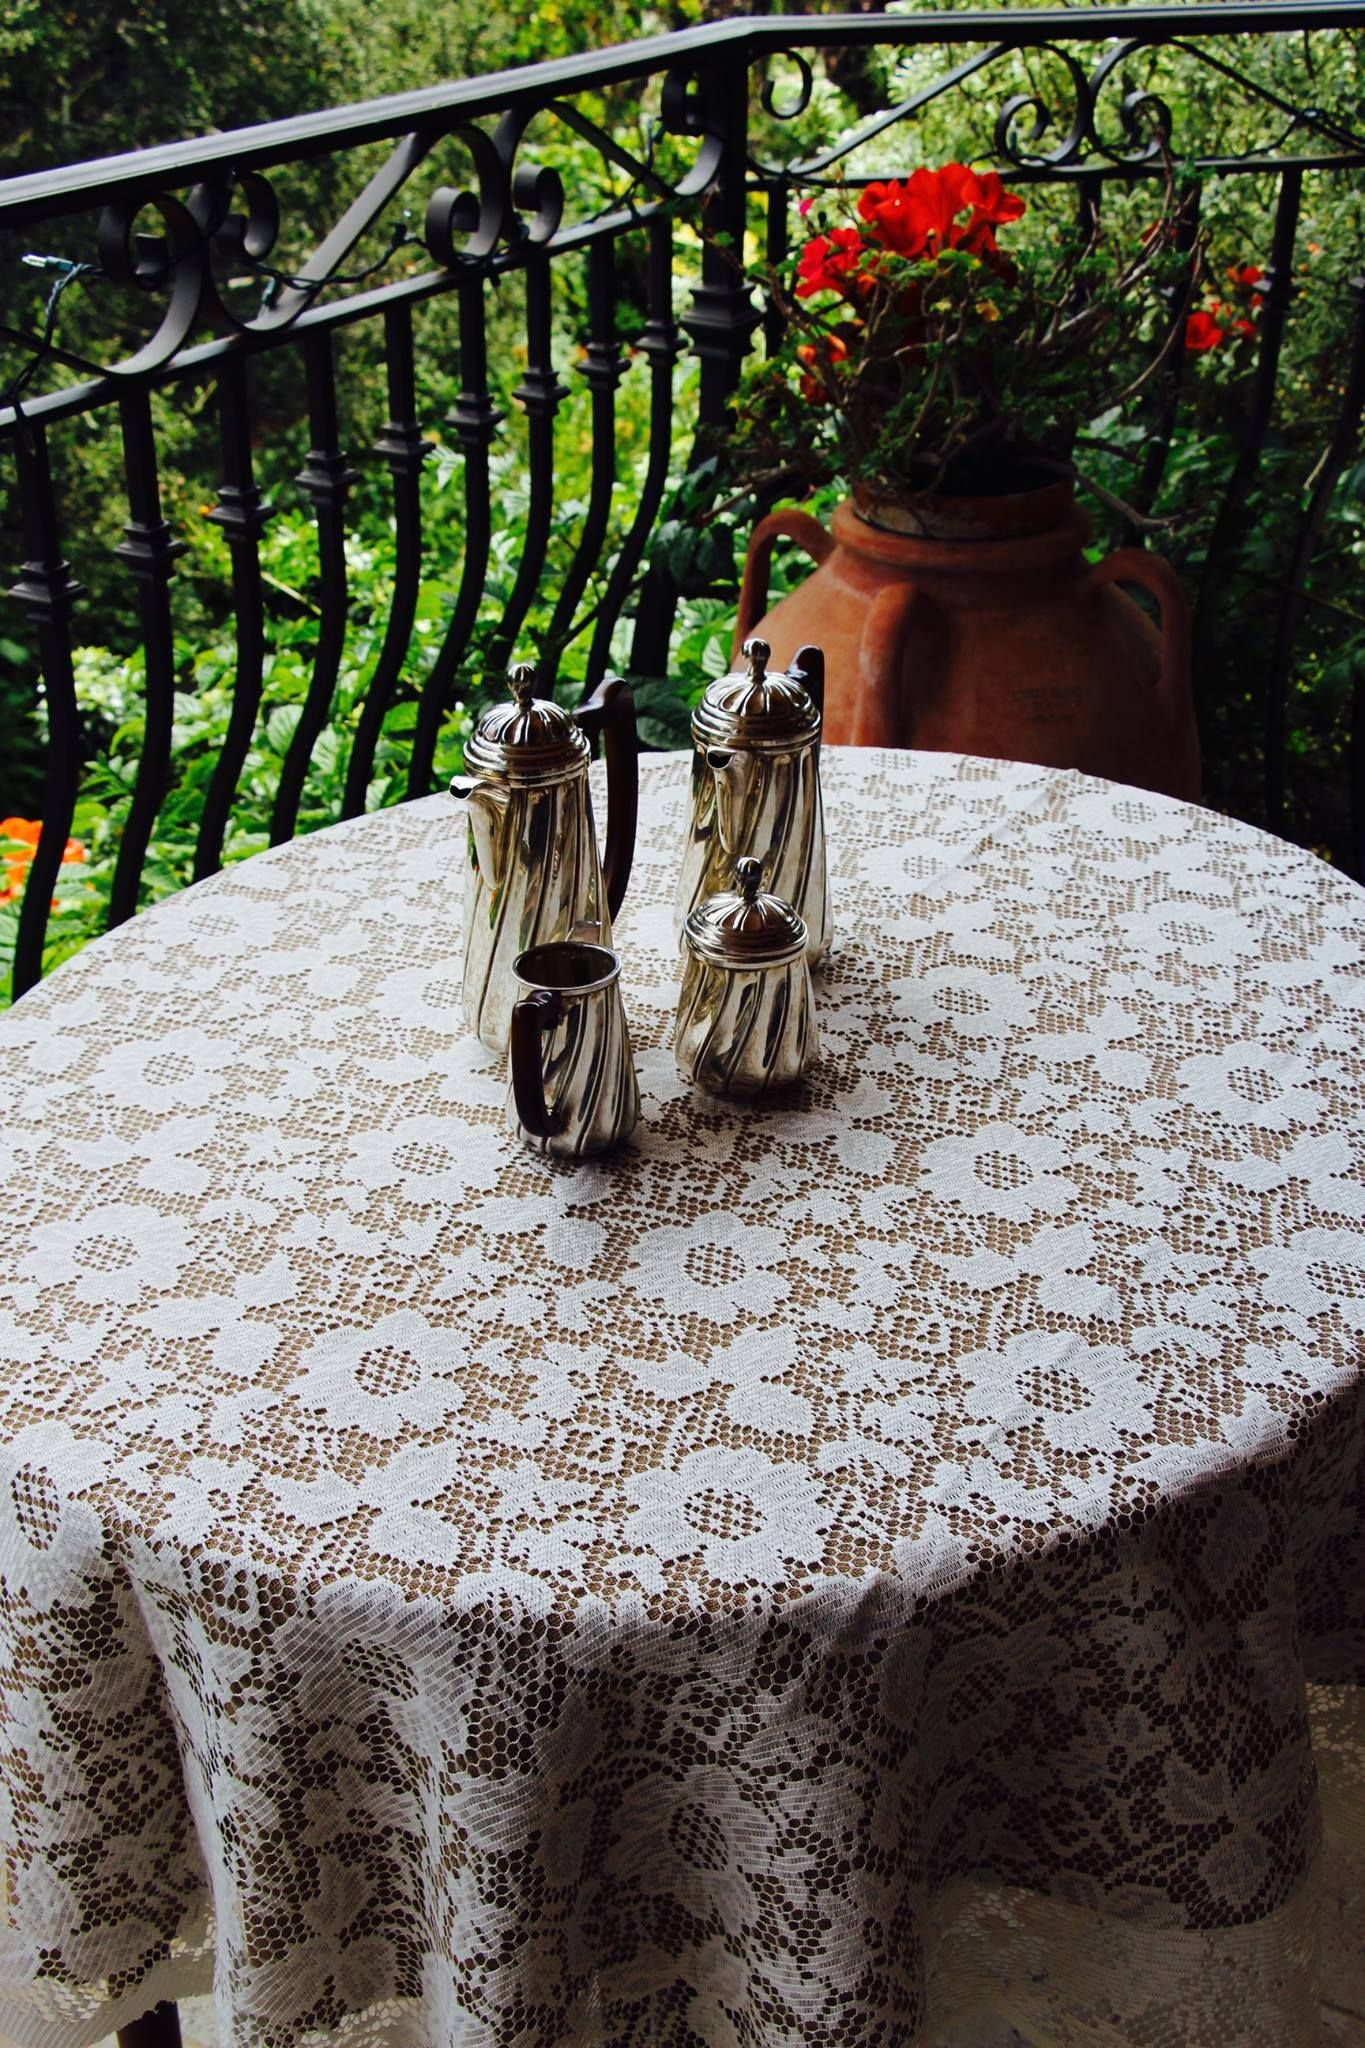 Medium Of Premier Table Linens